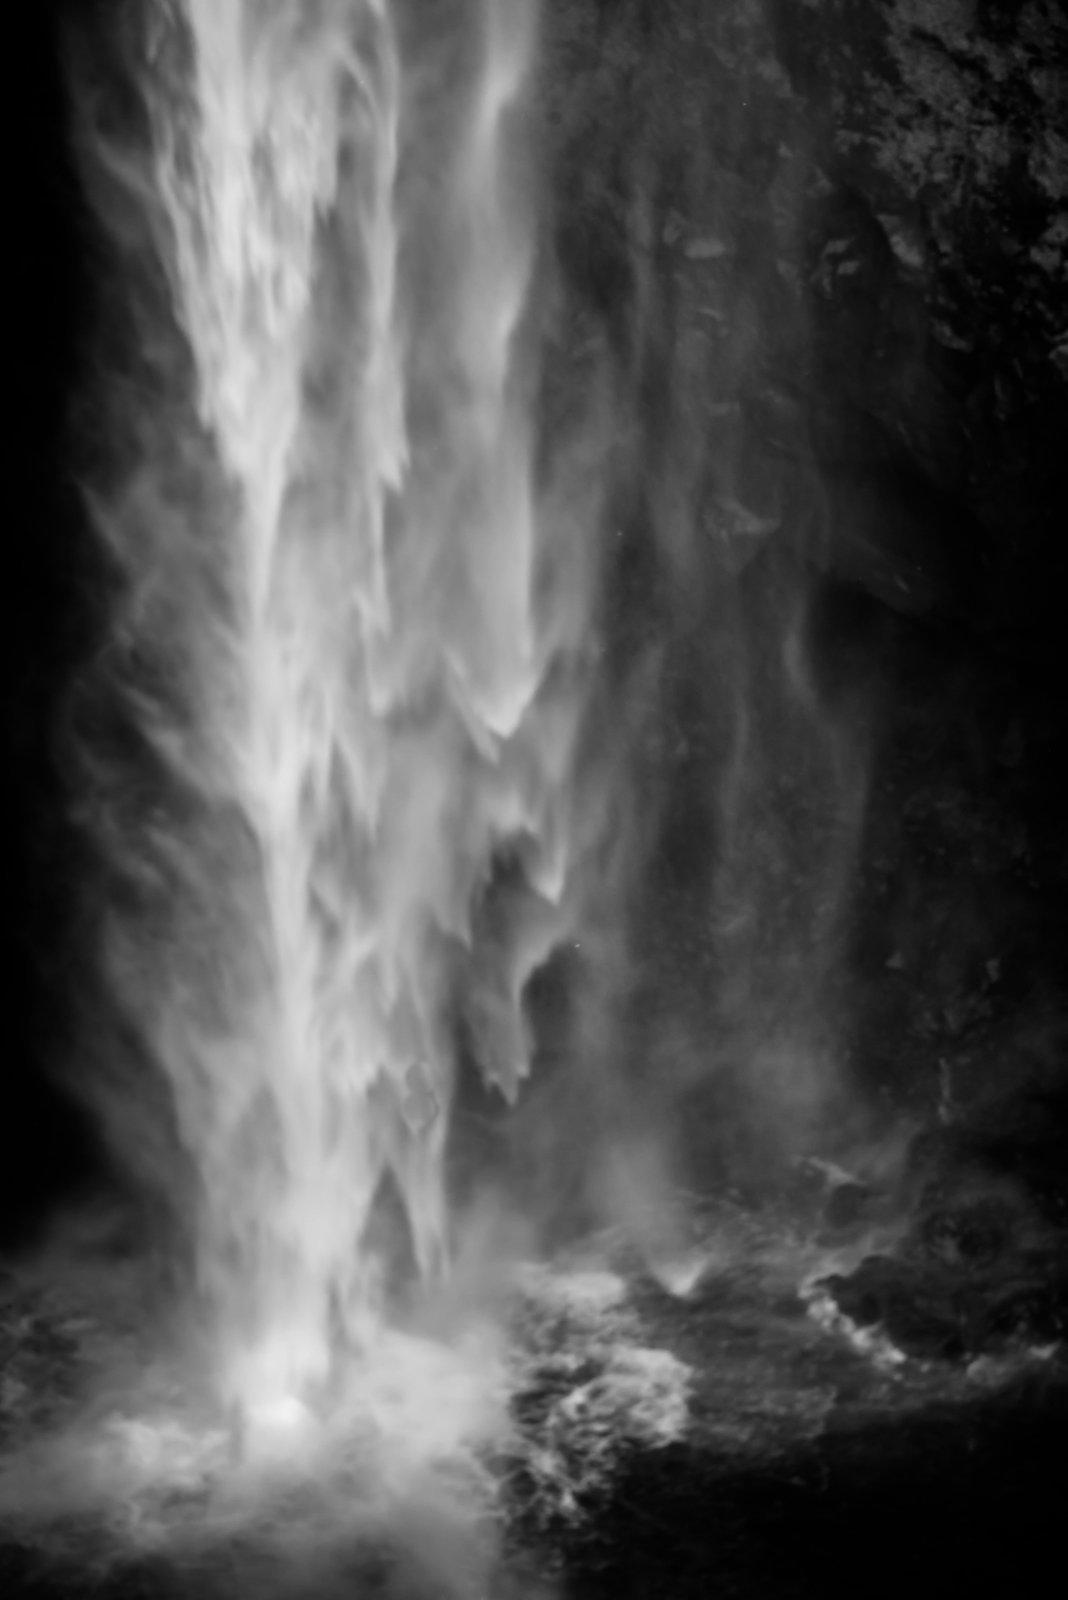 Waterfall01tif.jpg